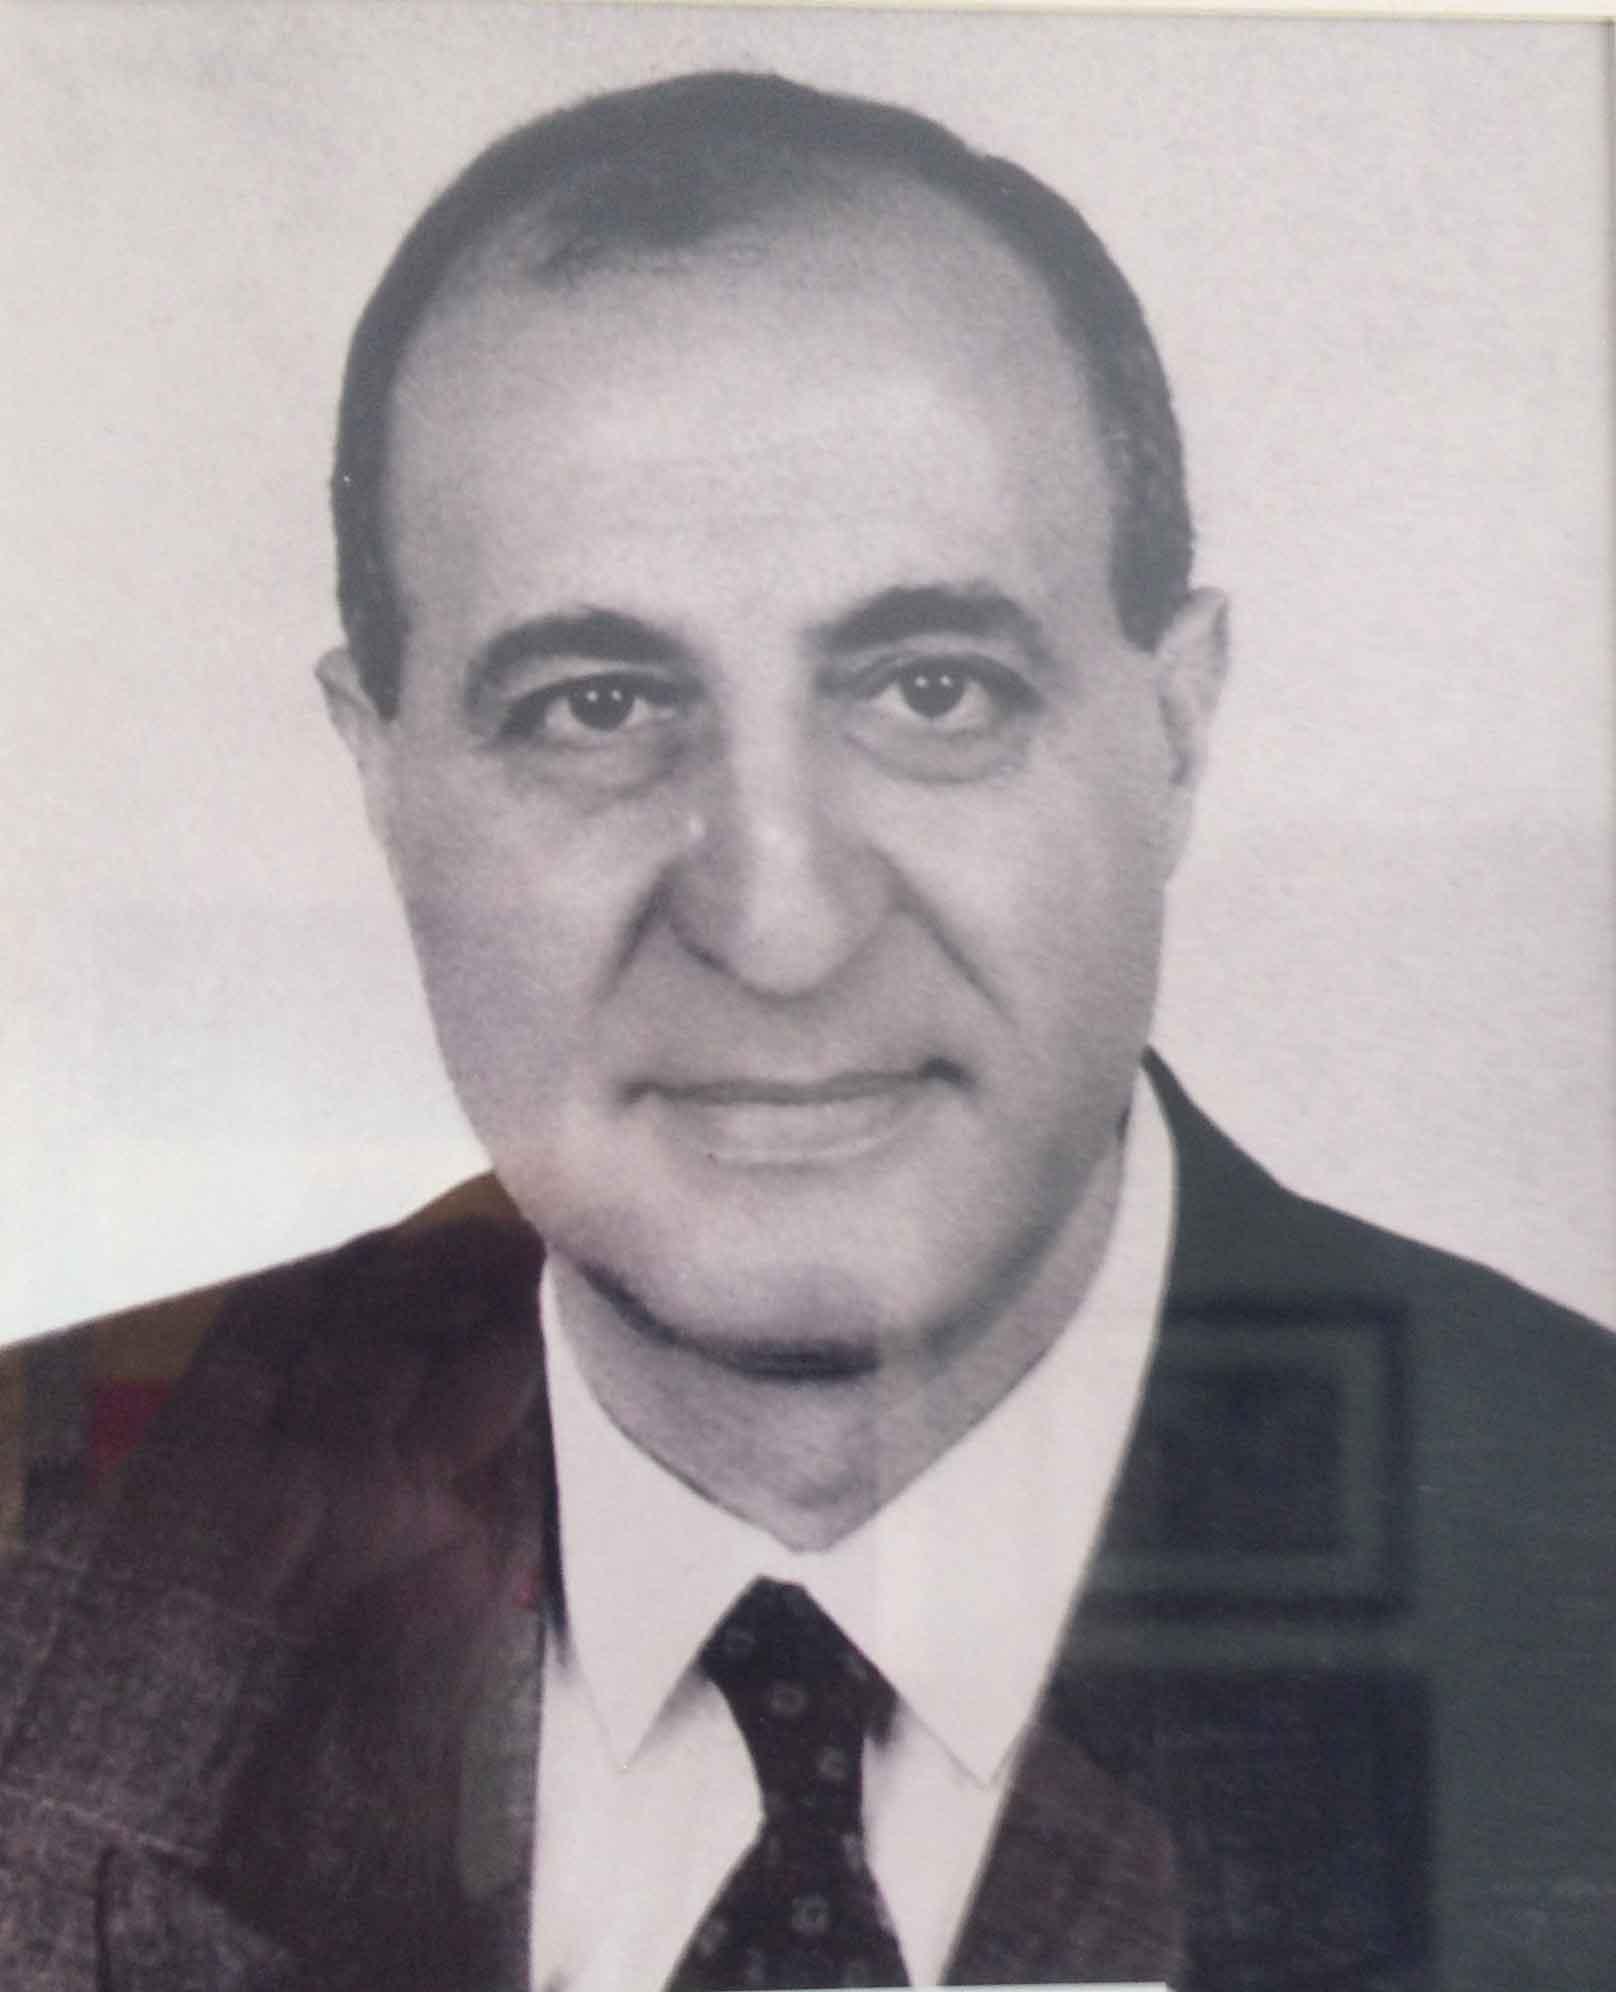 Mr. Othmane Lahlou